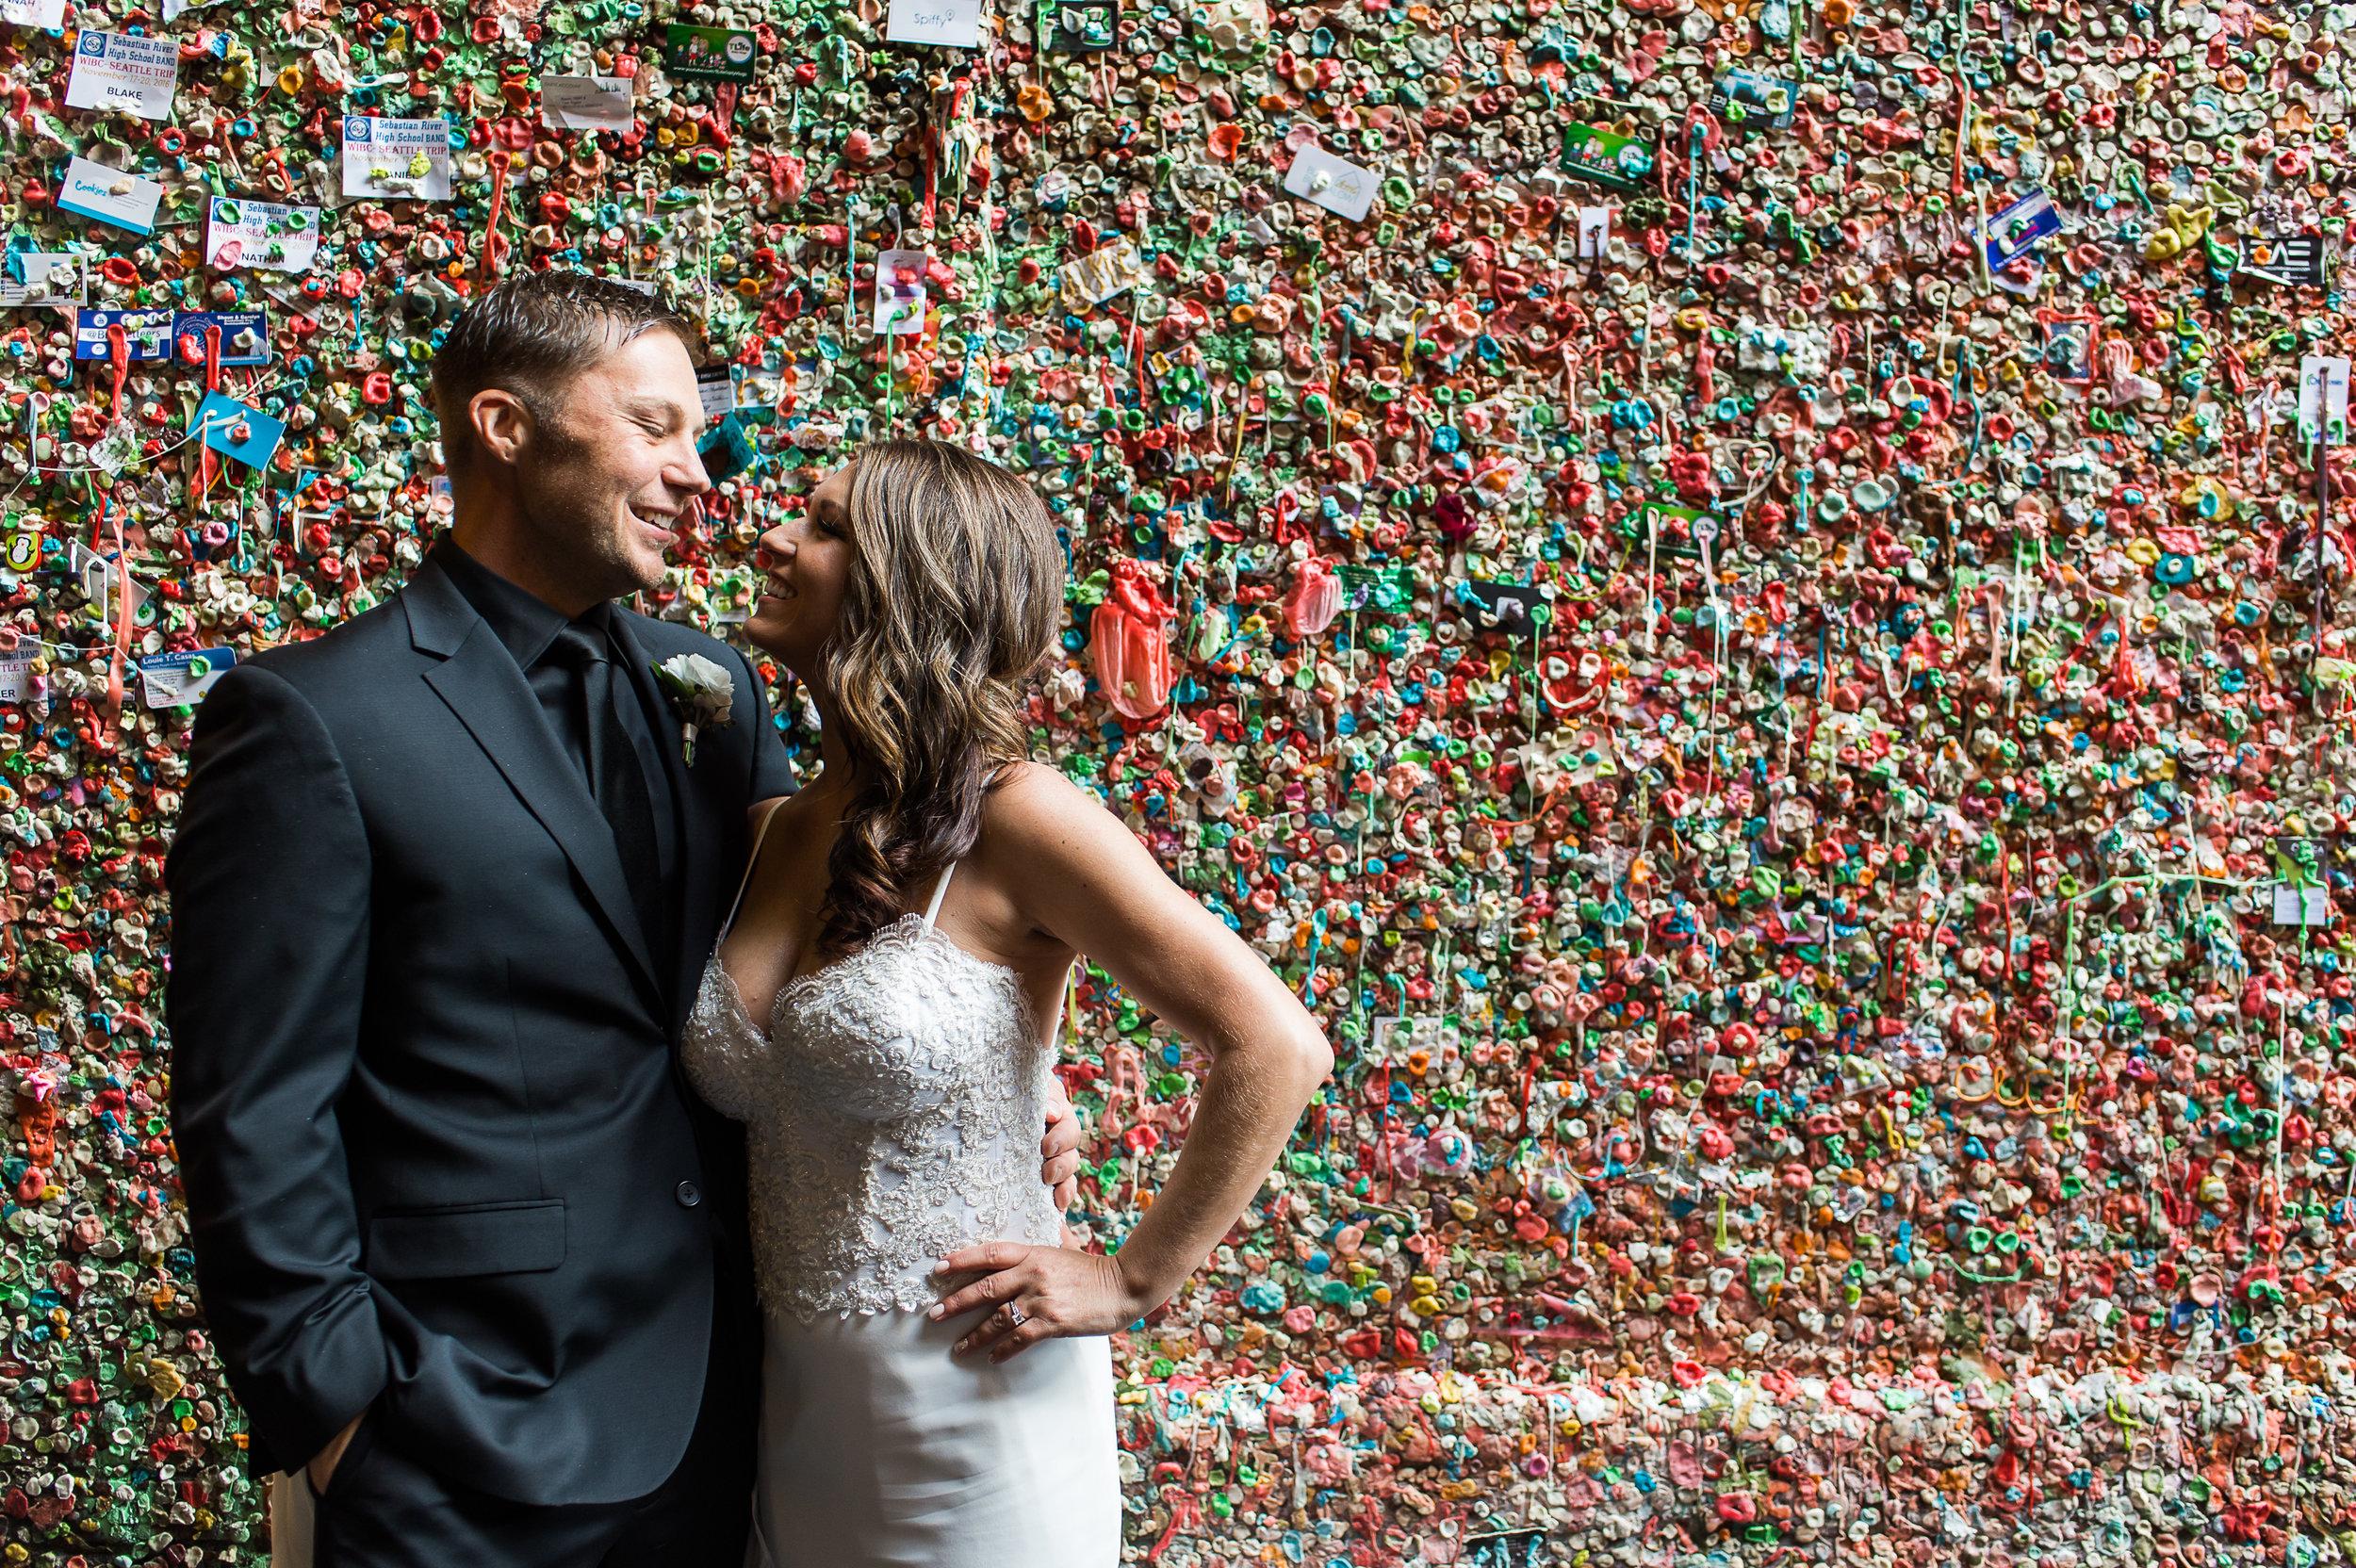 JJ-wedding-Van-Wyhe-Photography-171.jpg